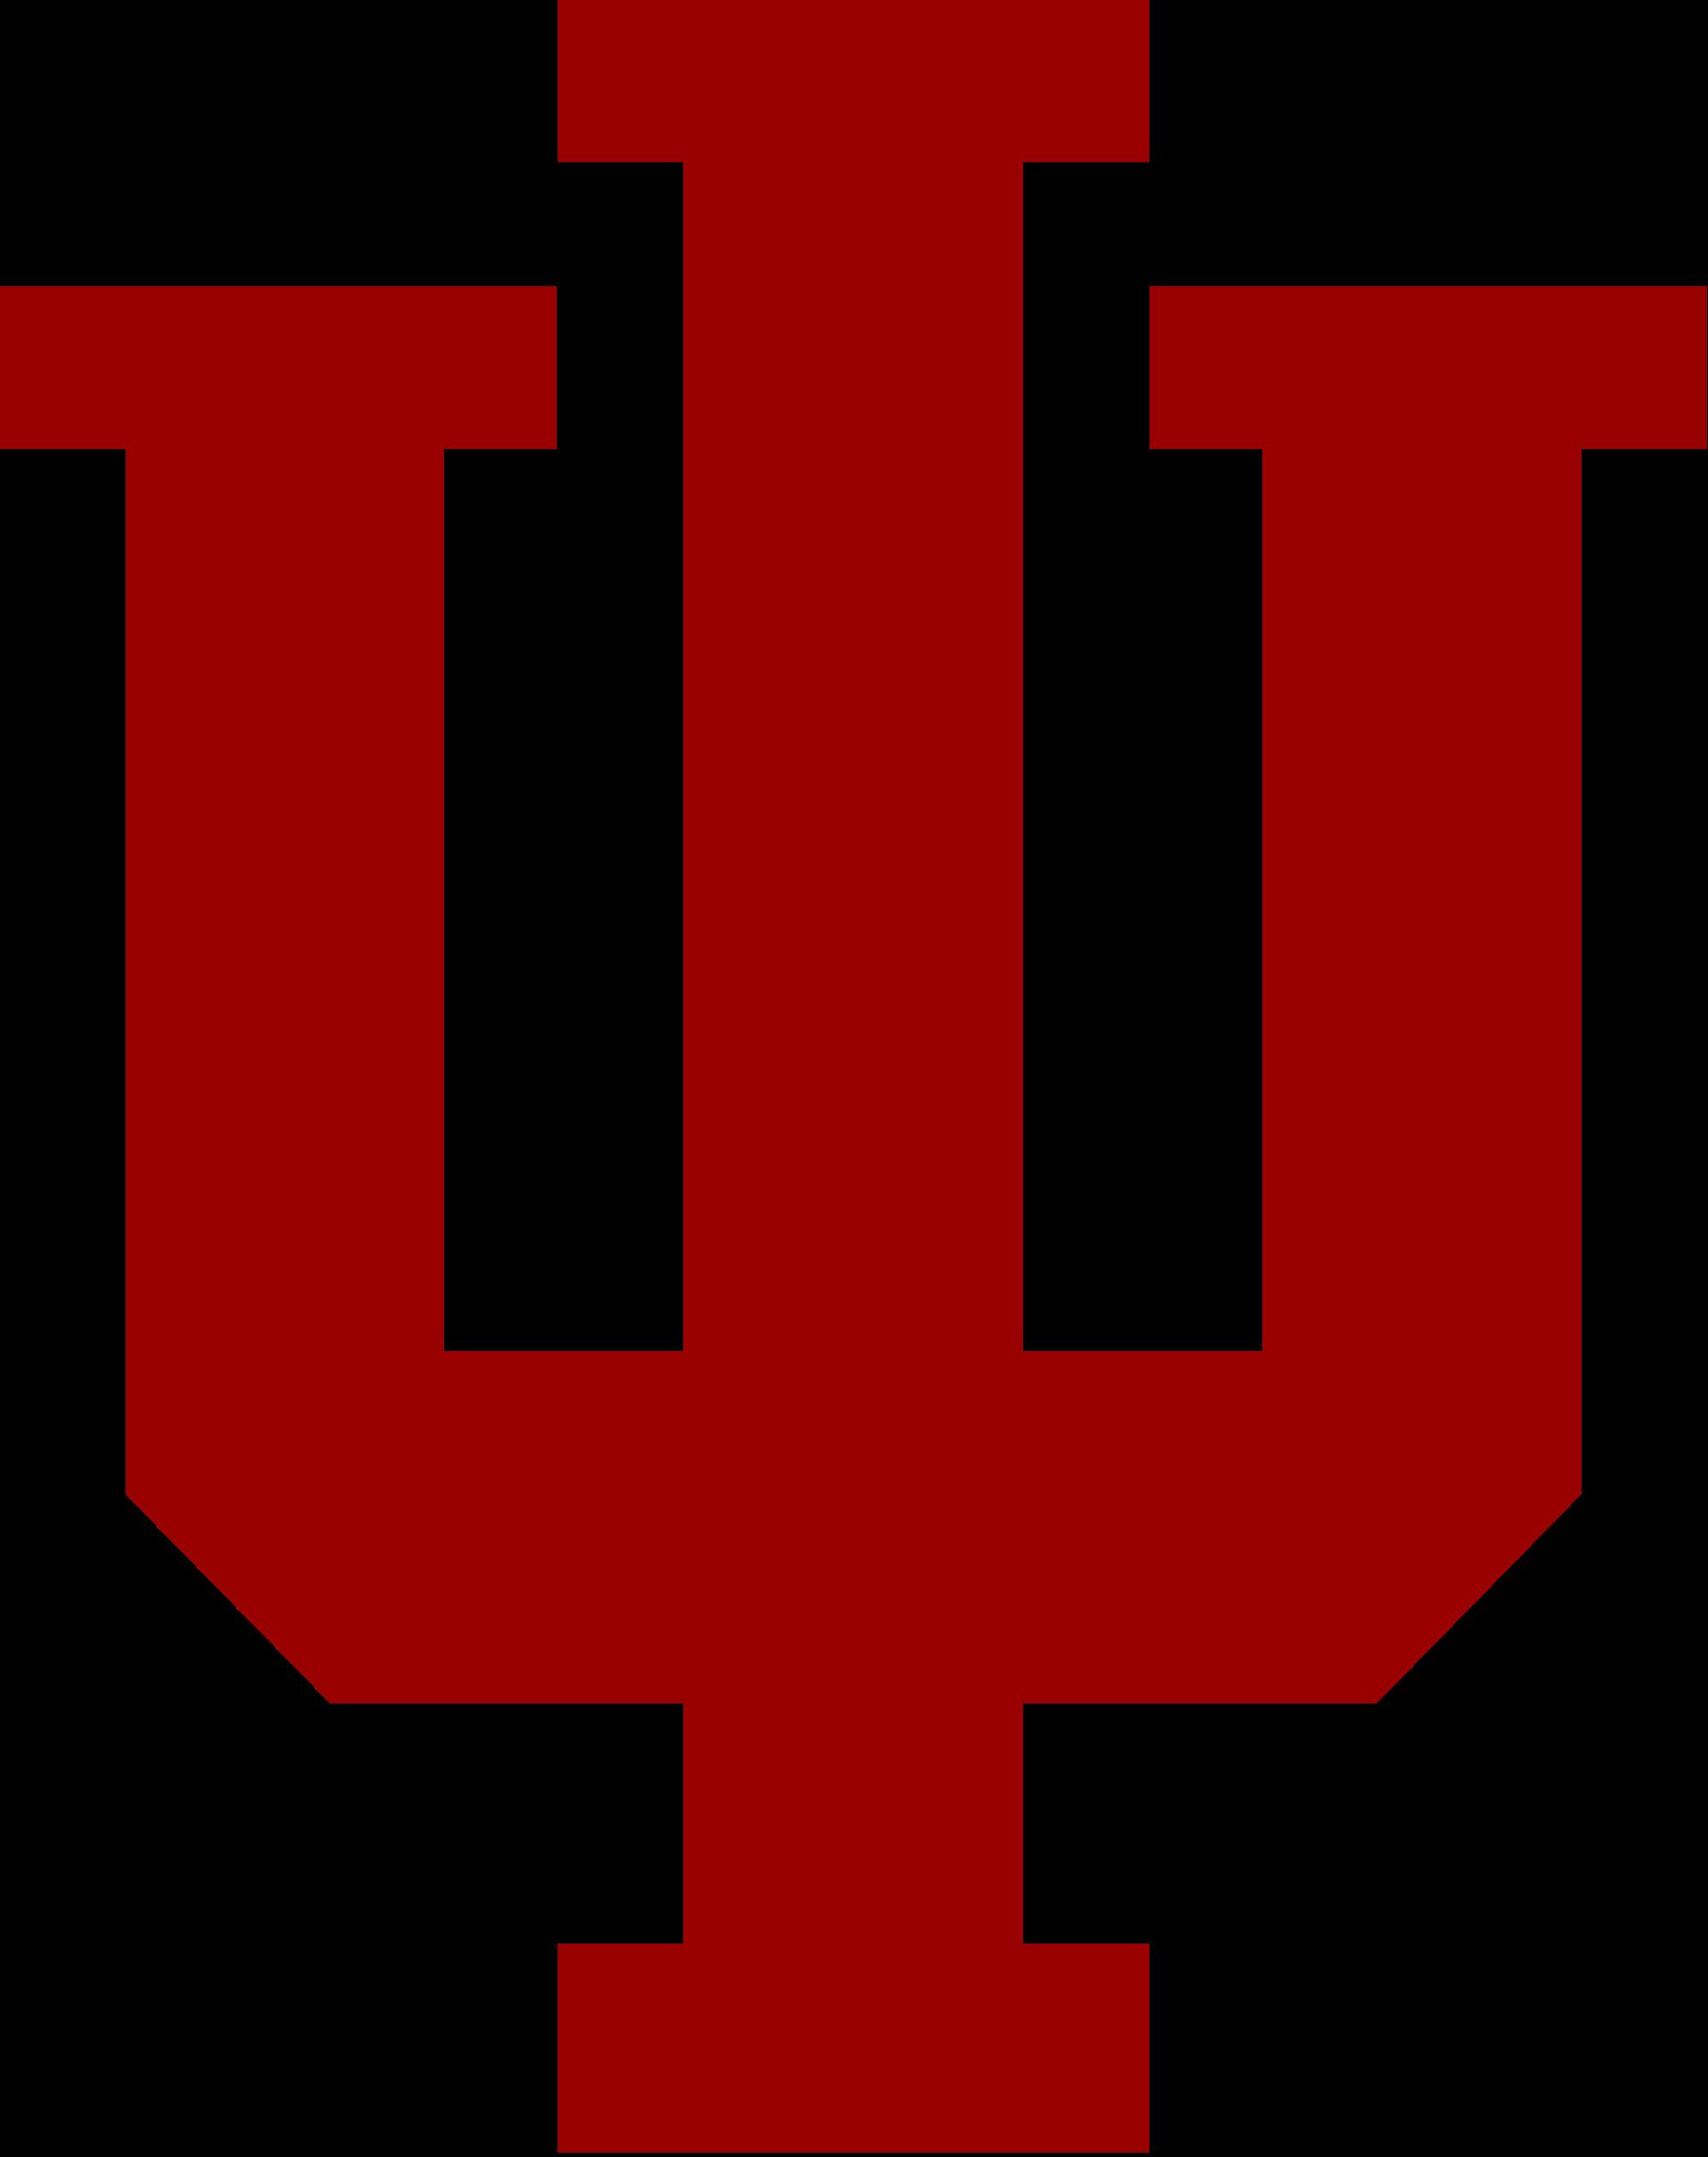 Indiana_Hoosiers_Logo.svg